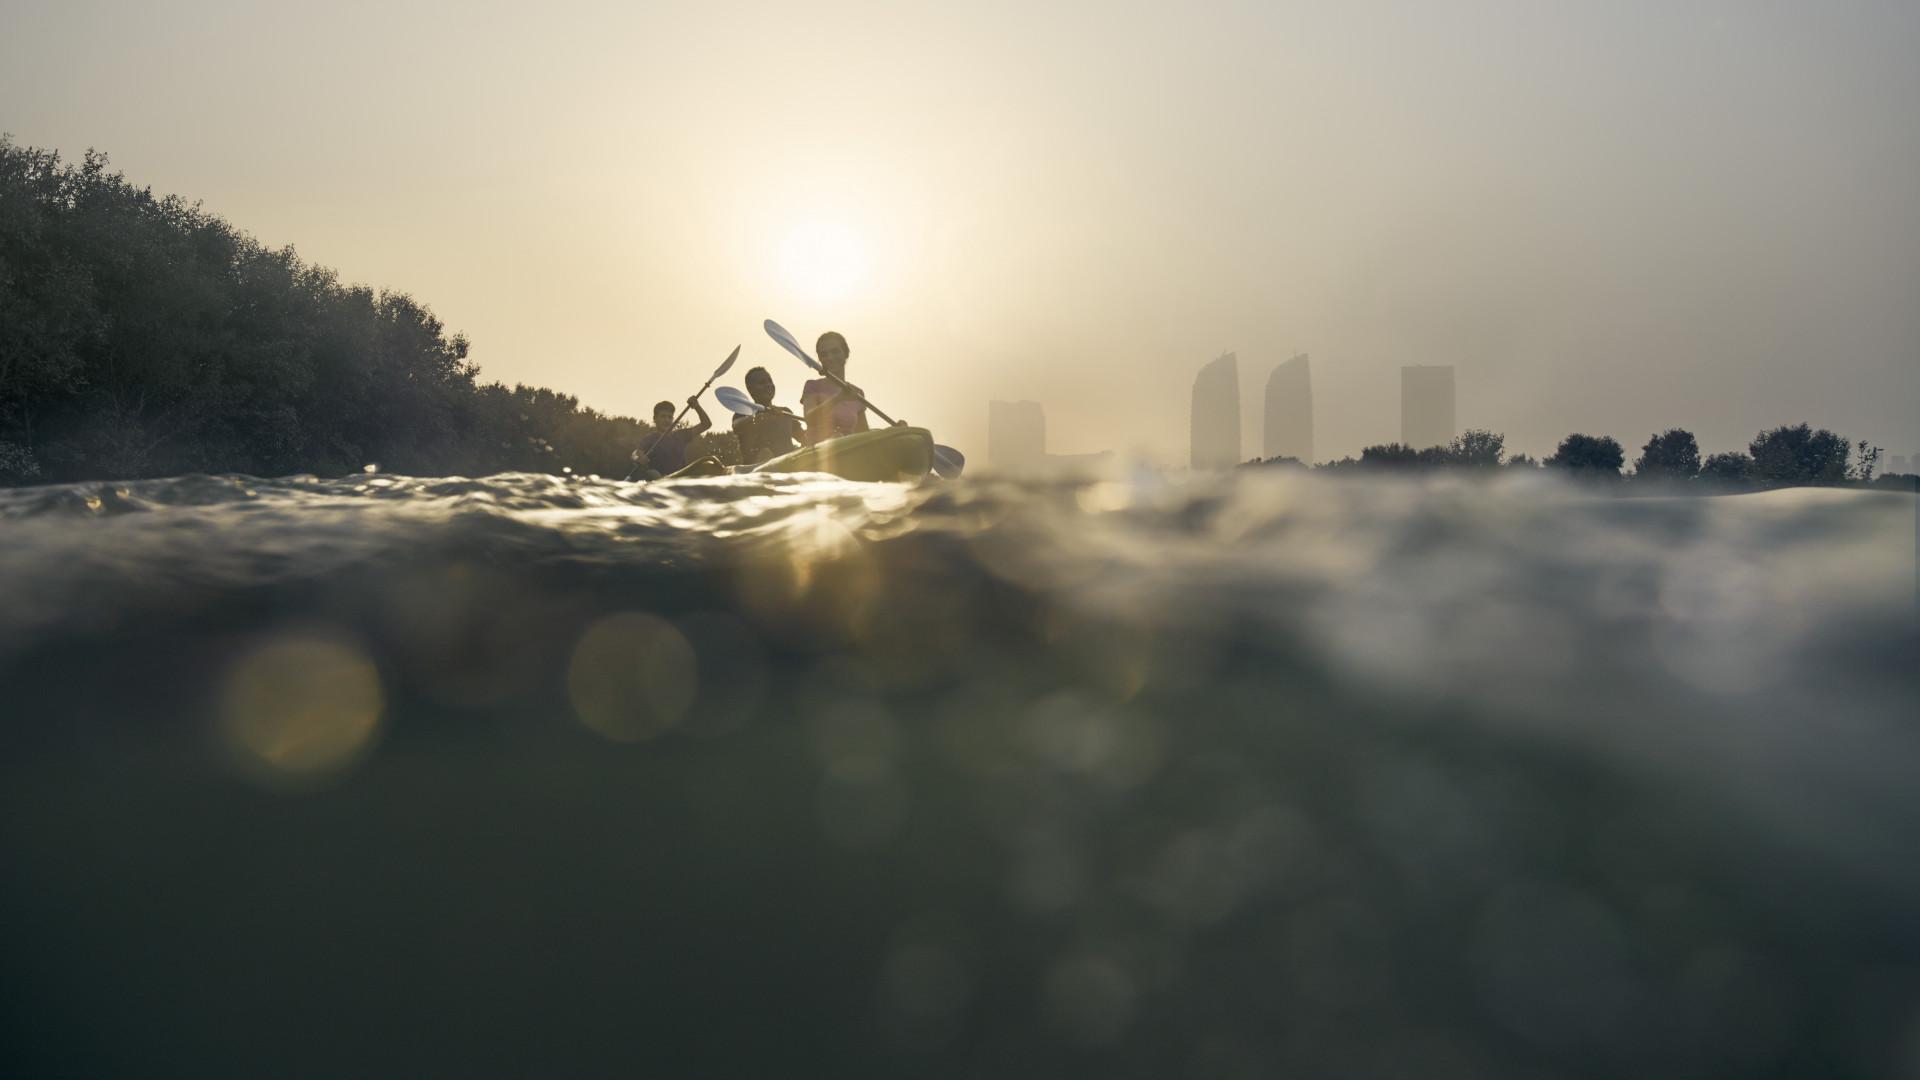 Kayaking in Abu Dhabi's East Mangrove National Park